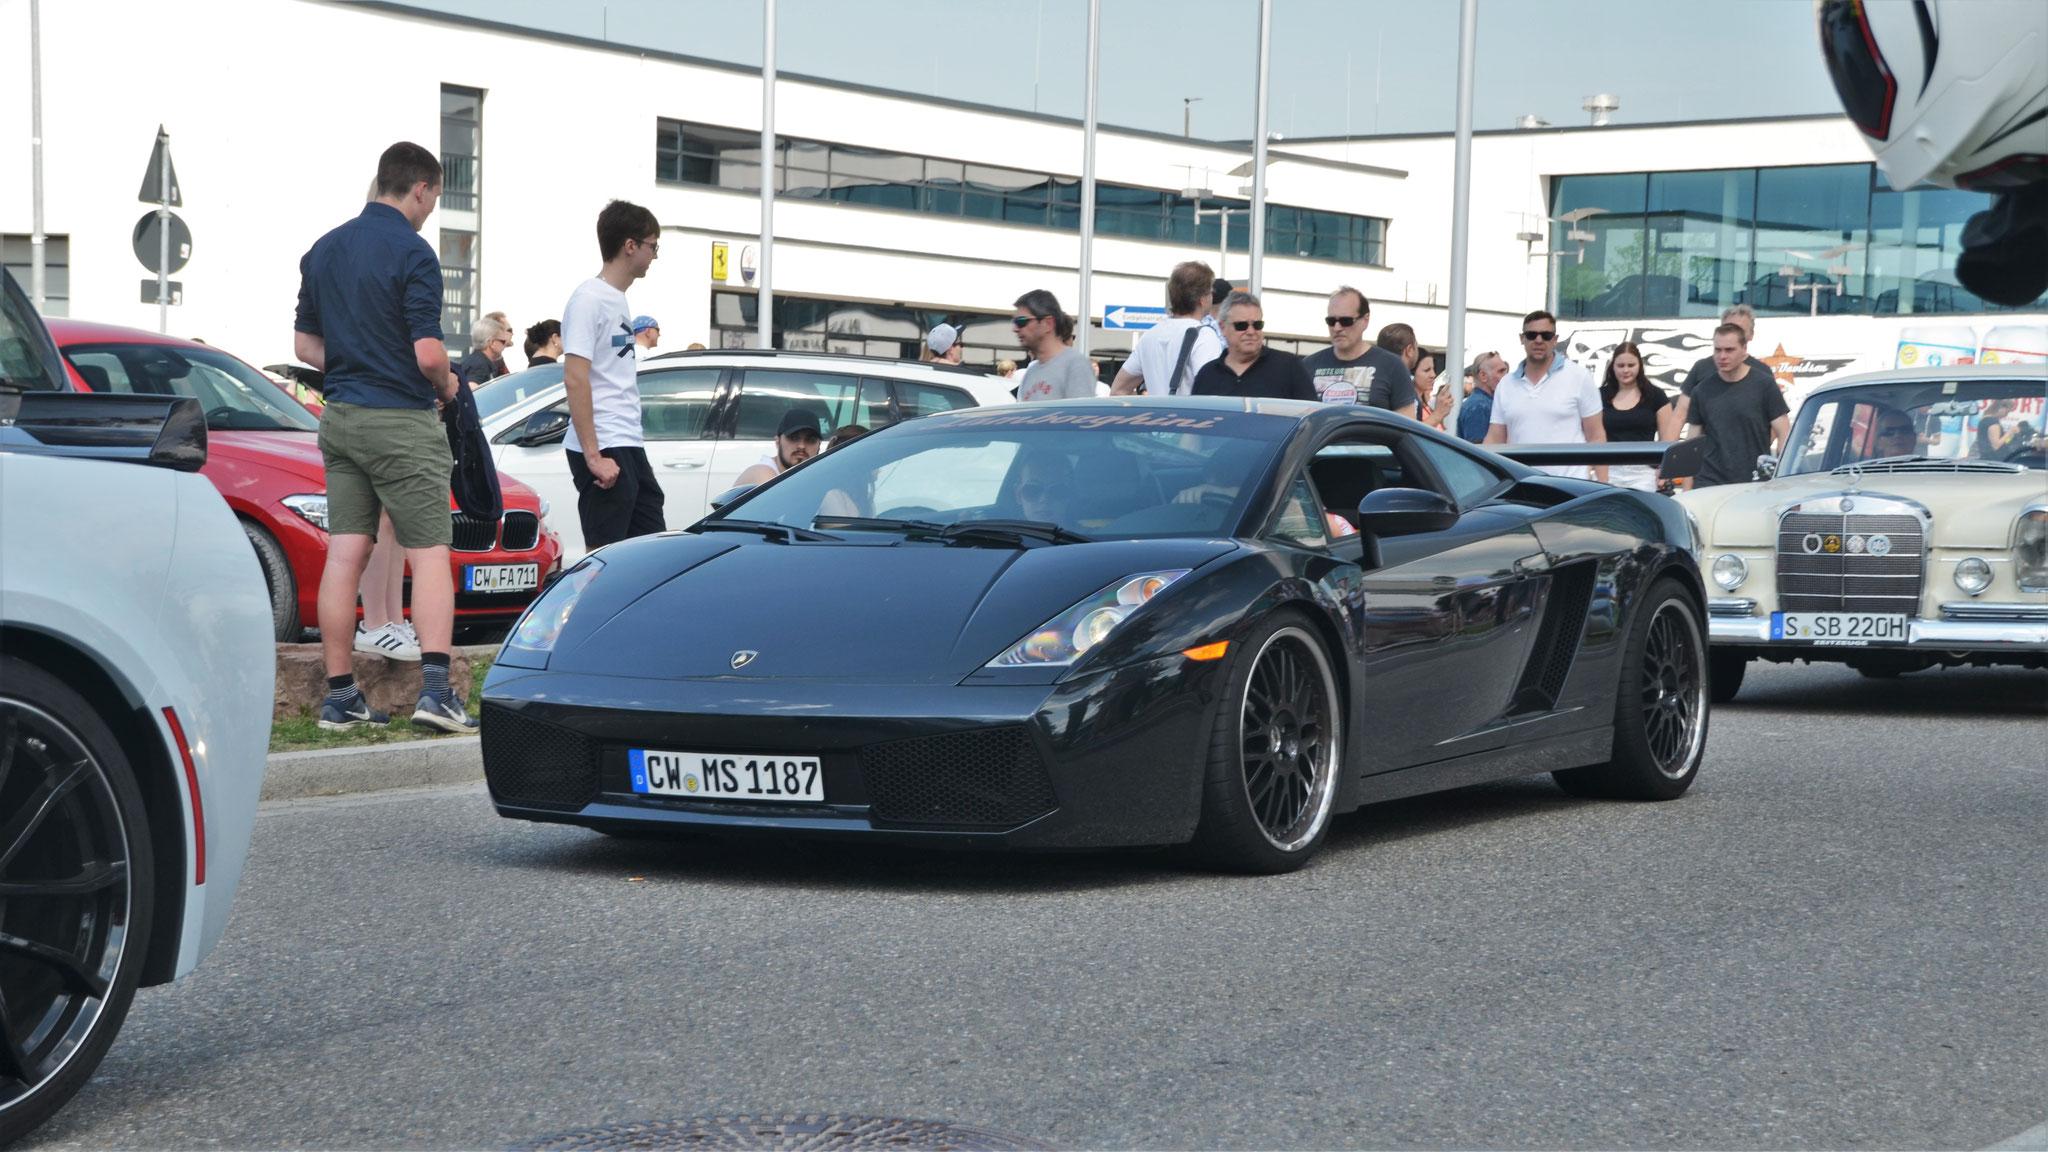 Lamborghini Gallardo Coupé - CW-MS-1187